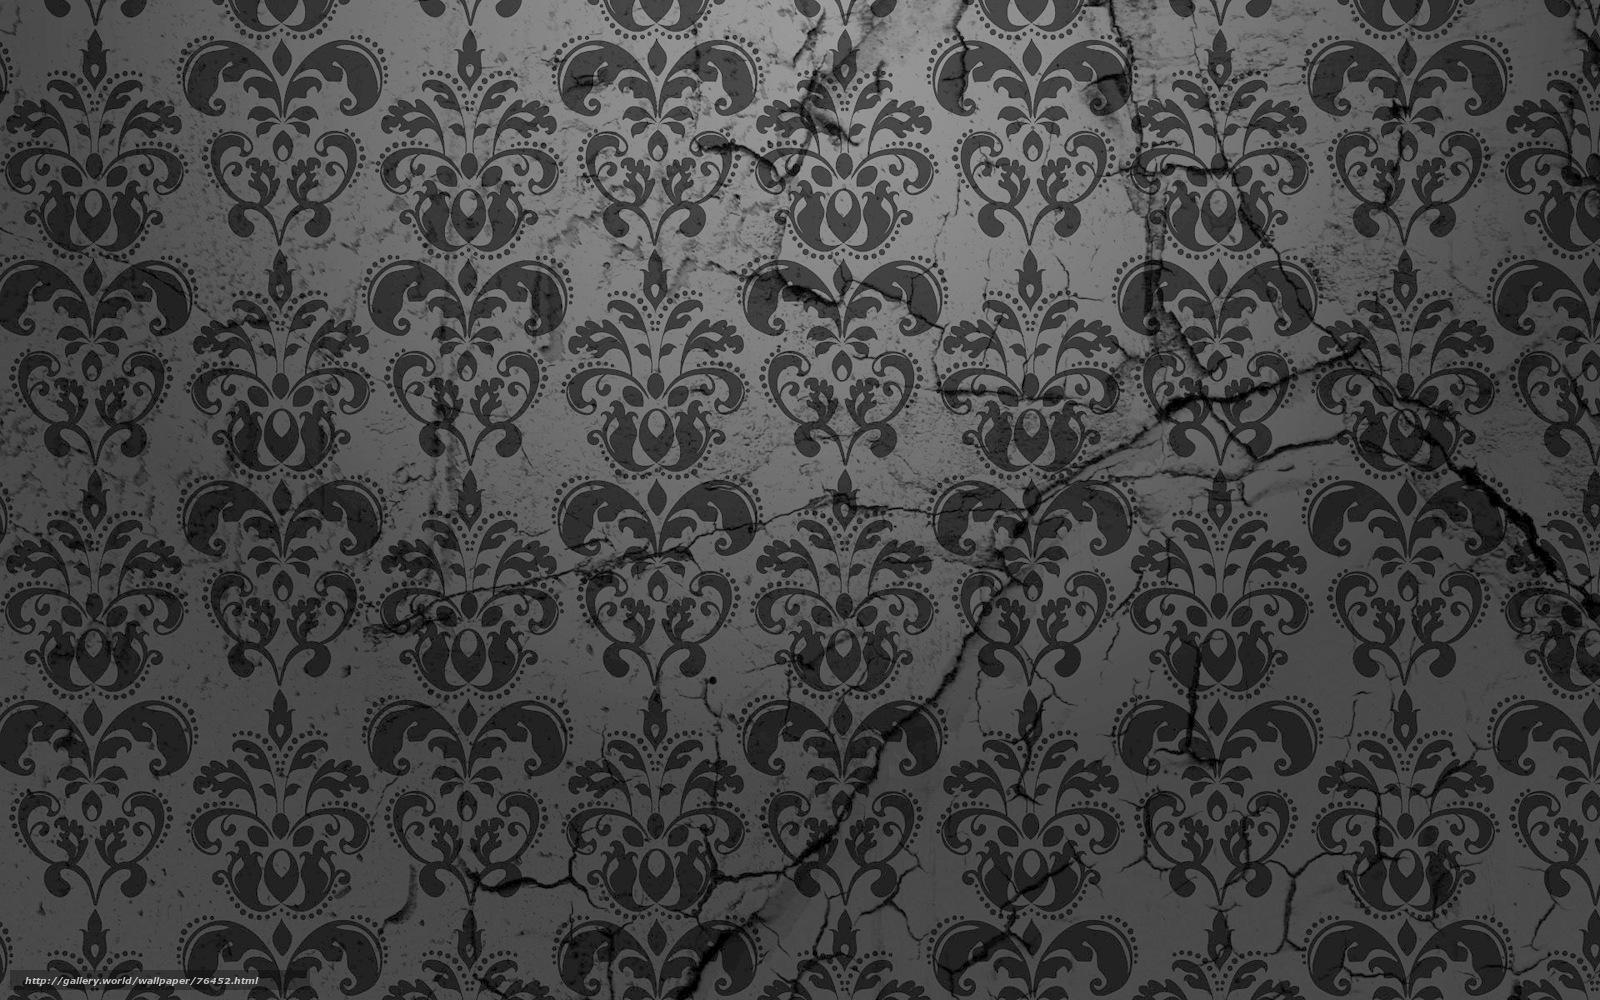 baixar wallpaper fundo preto - photo #22